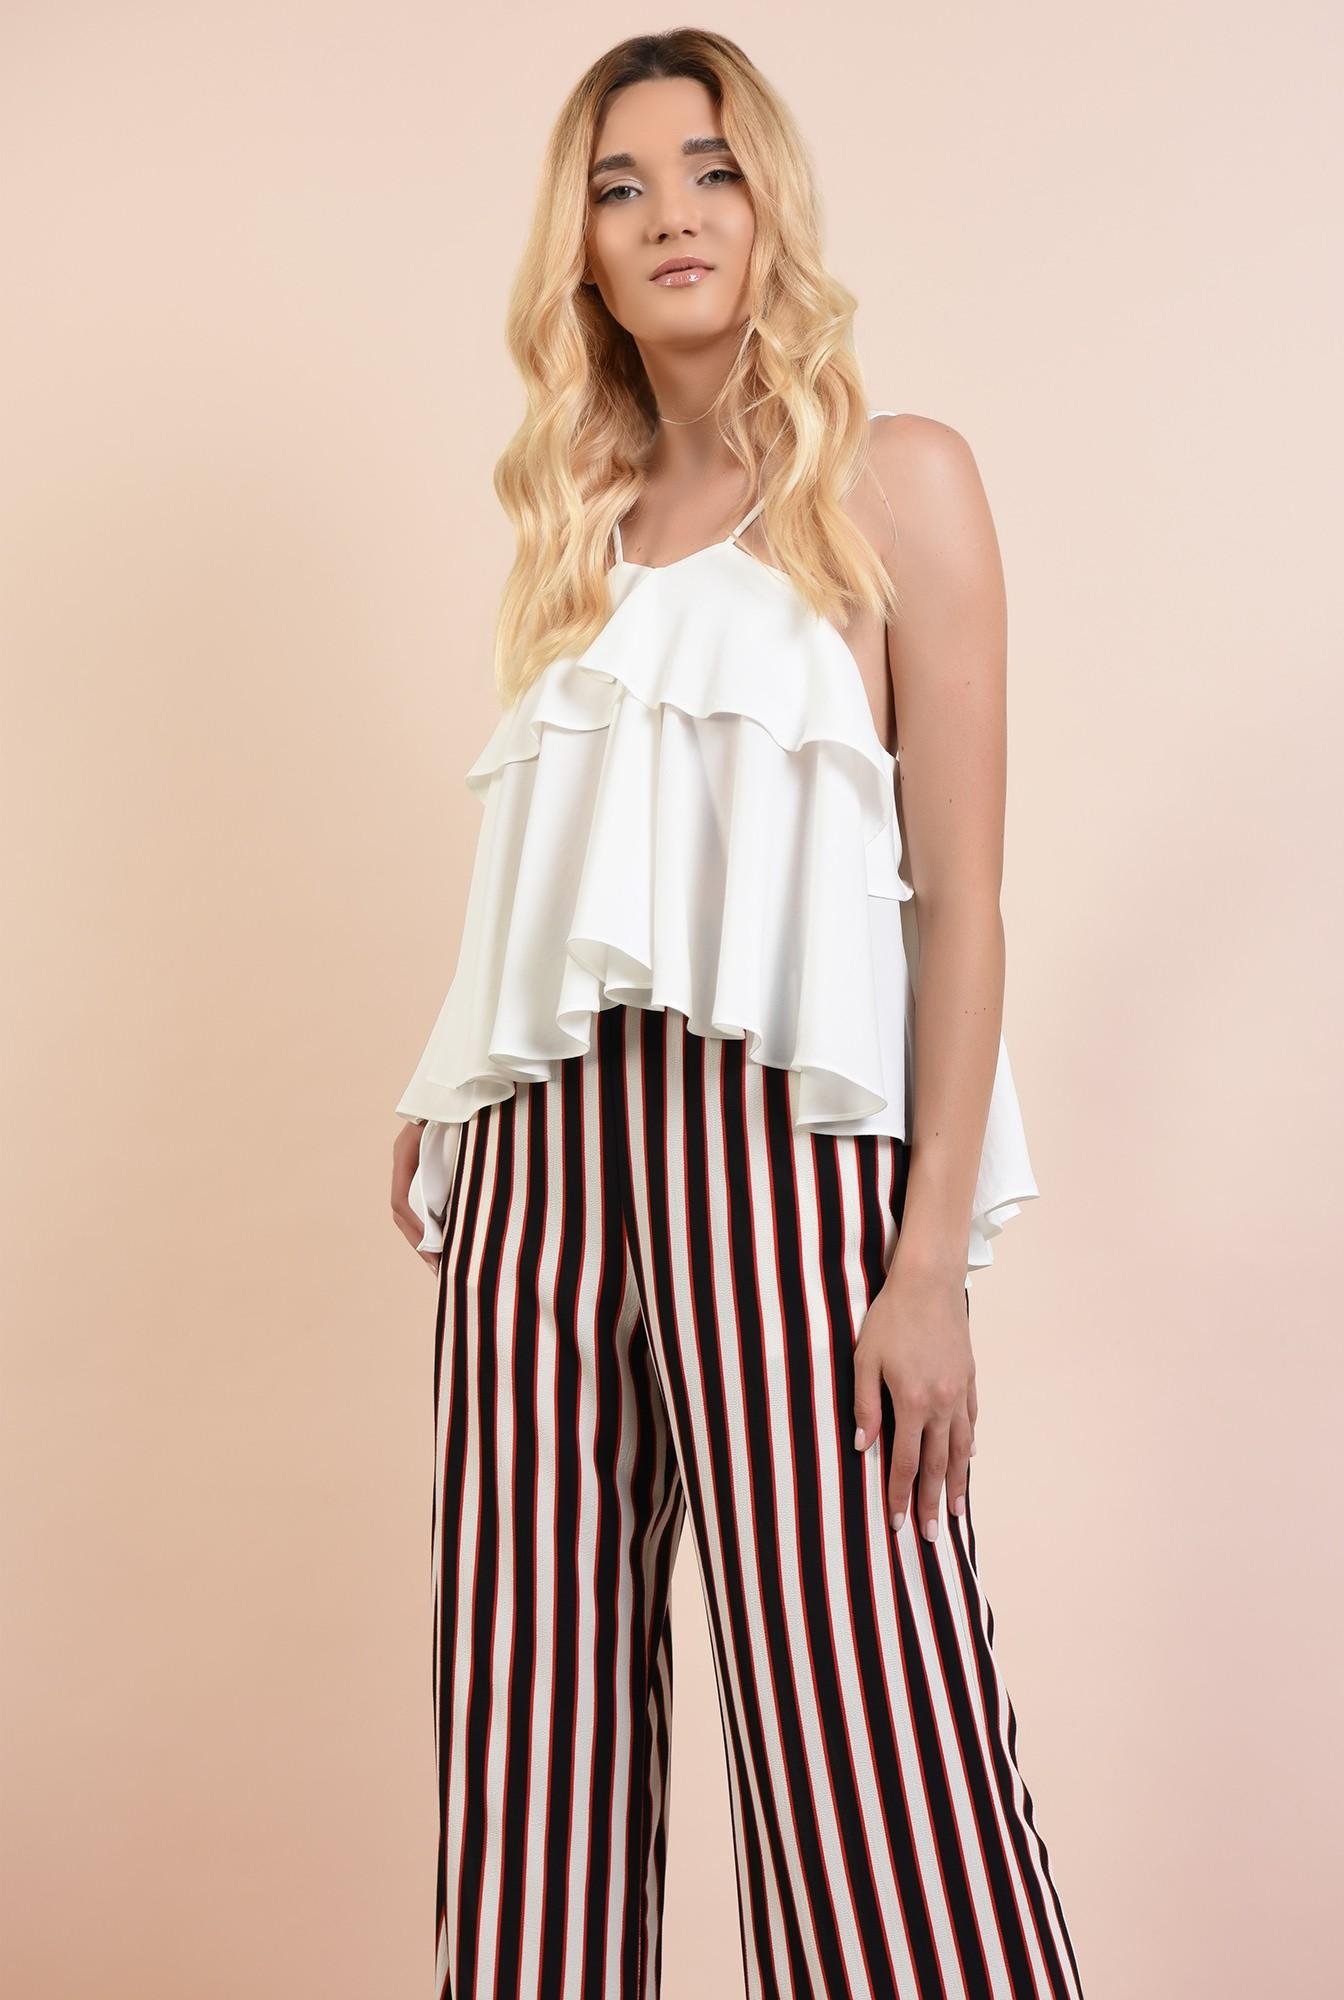 2 - 360 - pantaloni cu dungi, drepti, croi lejer, cu talie elastica, buzunare, Poema